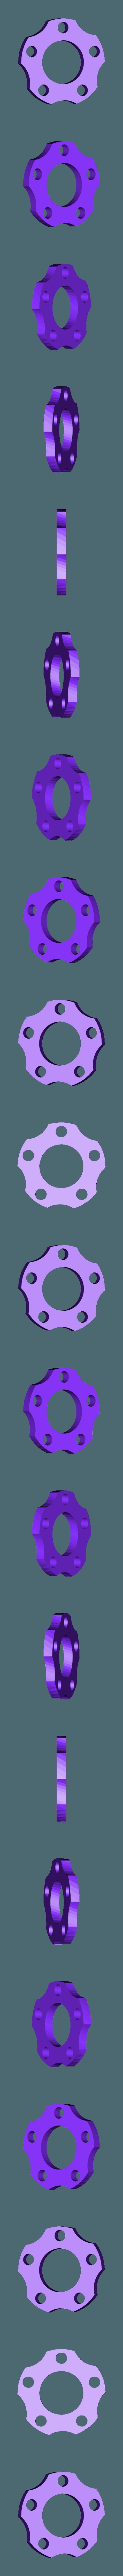 pinion_bearing_tap.stl Download free STL file Worm gear reducer 30:1 • Model to 3D print, dasaki